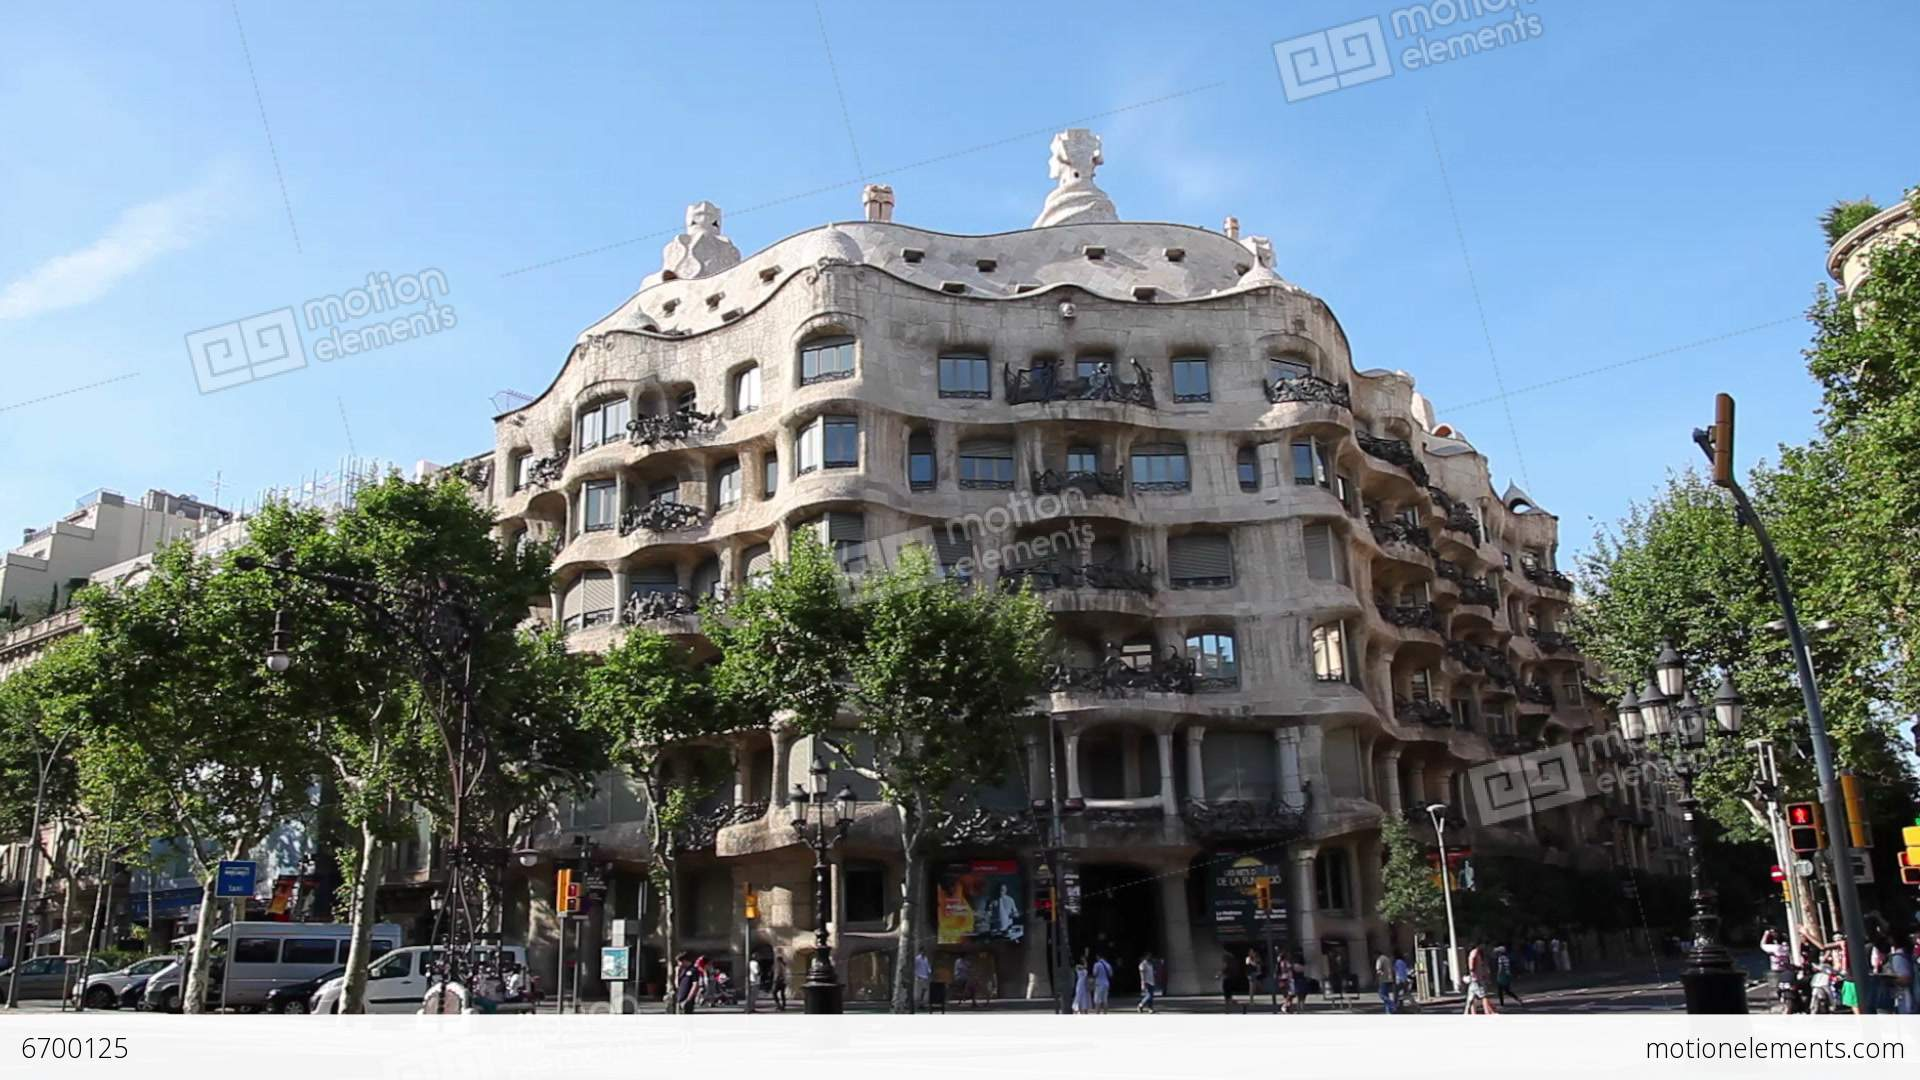 La pedrera casa mila gaudi building in barcelona stock video footage 6700125 - Casa mila la pedrera ...